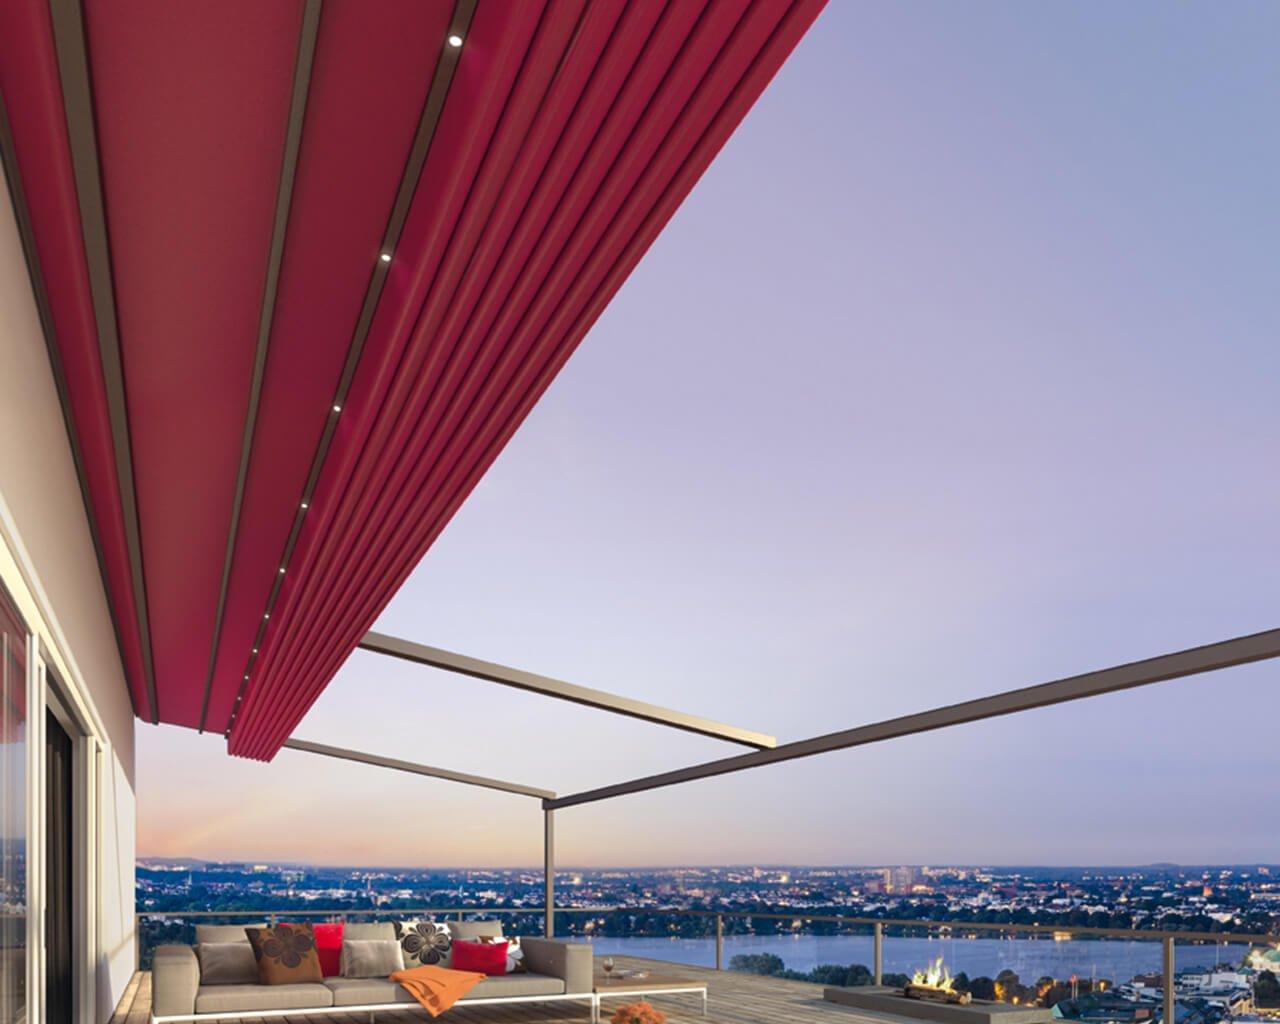 Pergotex retractable roof system